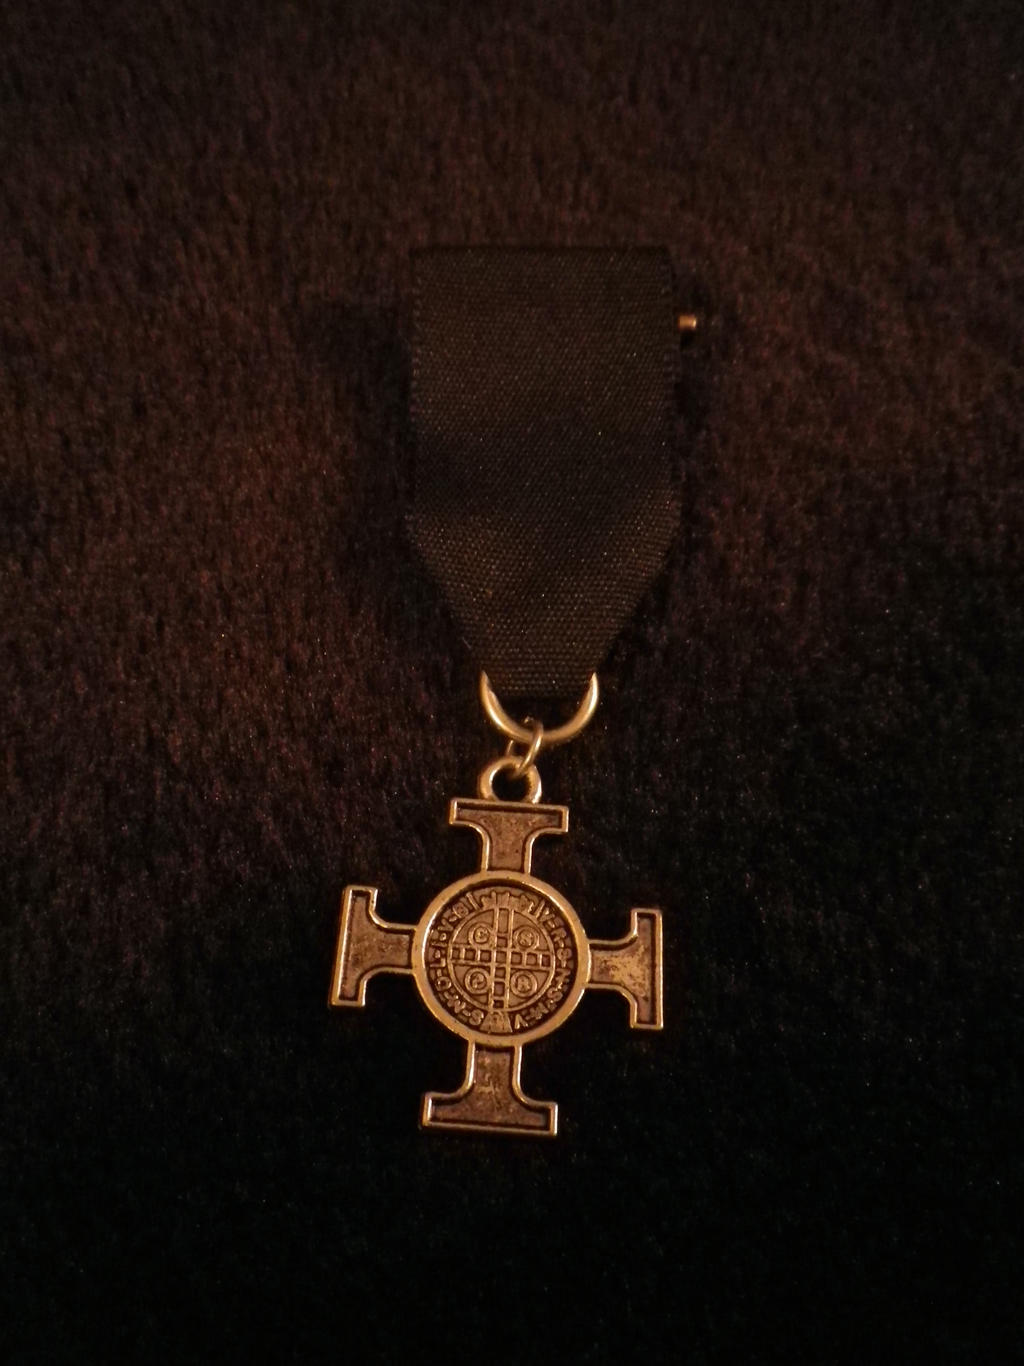 Alliance Fleet Steampunk Medal by SteamworkMedals